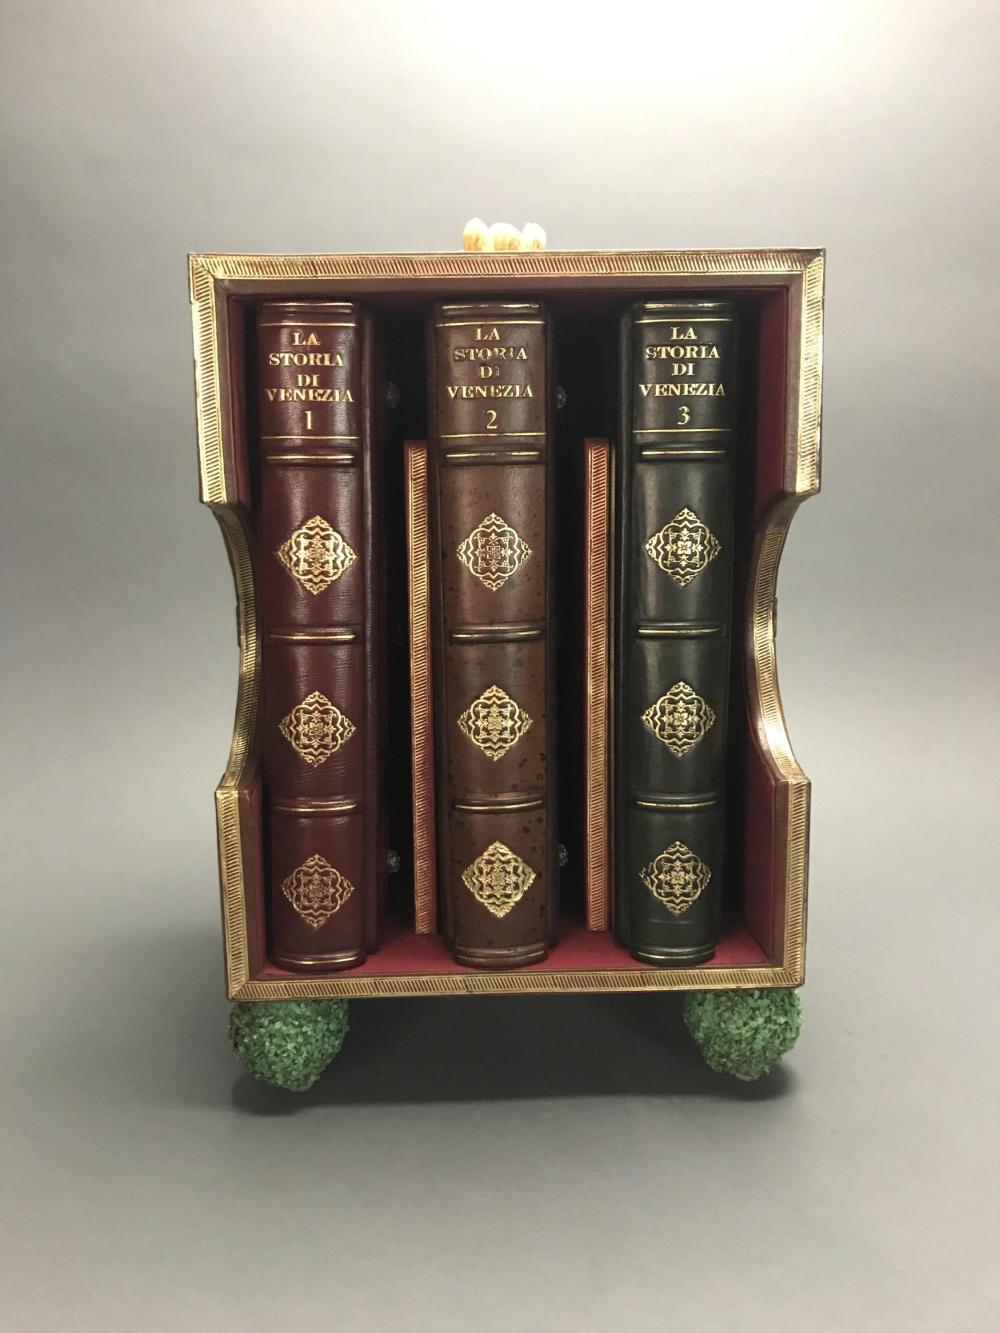 3 vols. La Storia di Venezia. Custom Venetian Case